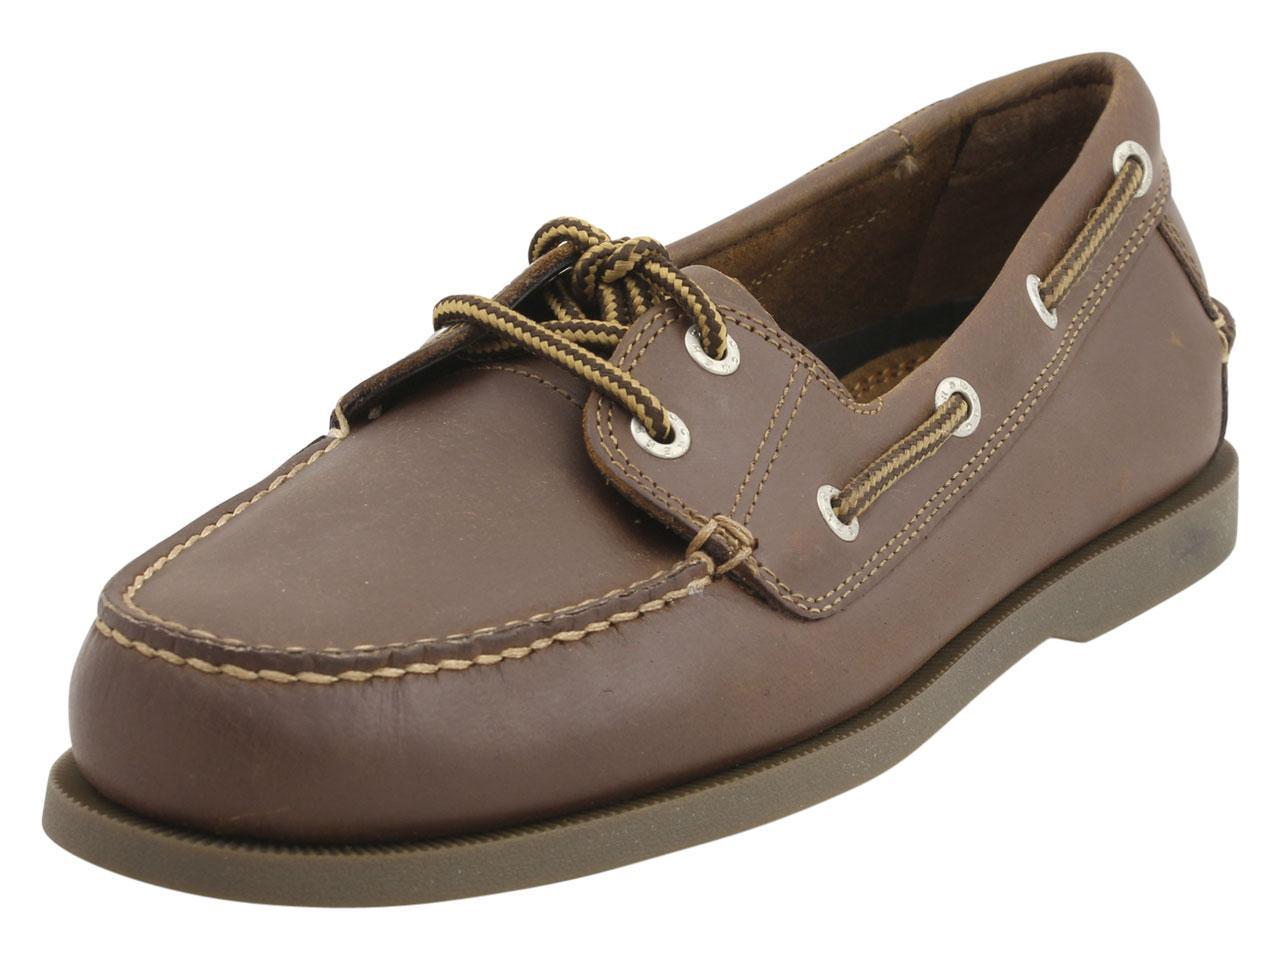 Image of Dockers Men's Vargas Loafers Boat Shoes - Brown - 8 D(M) US